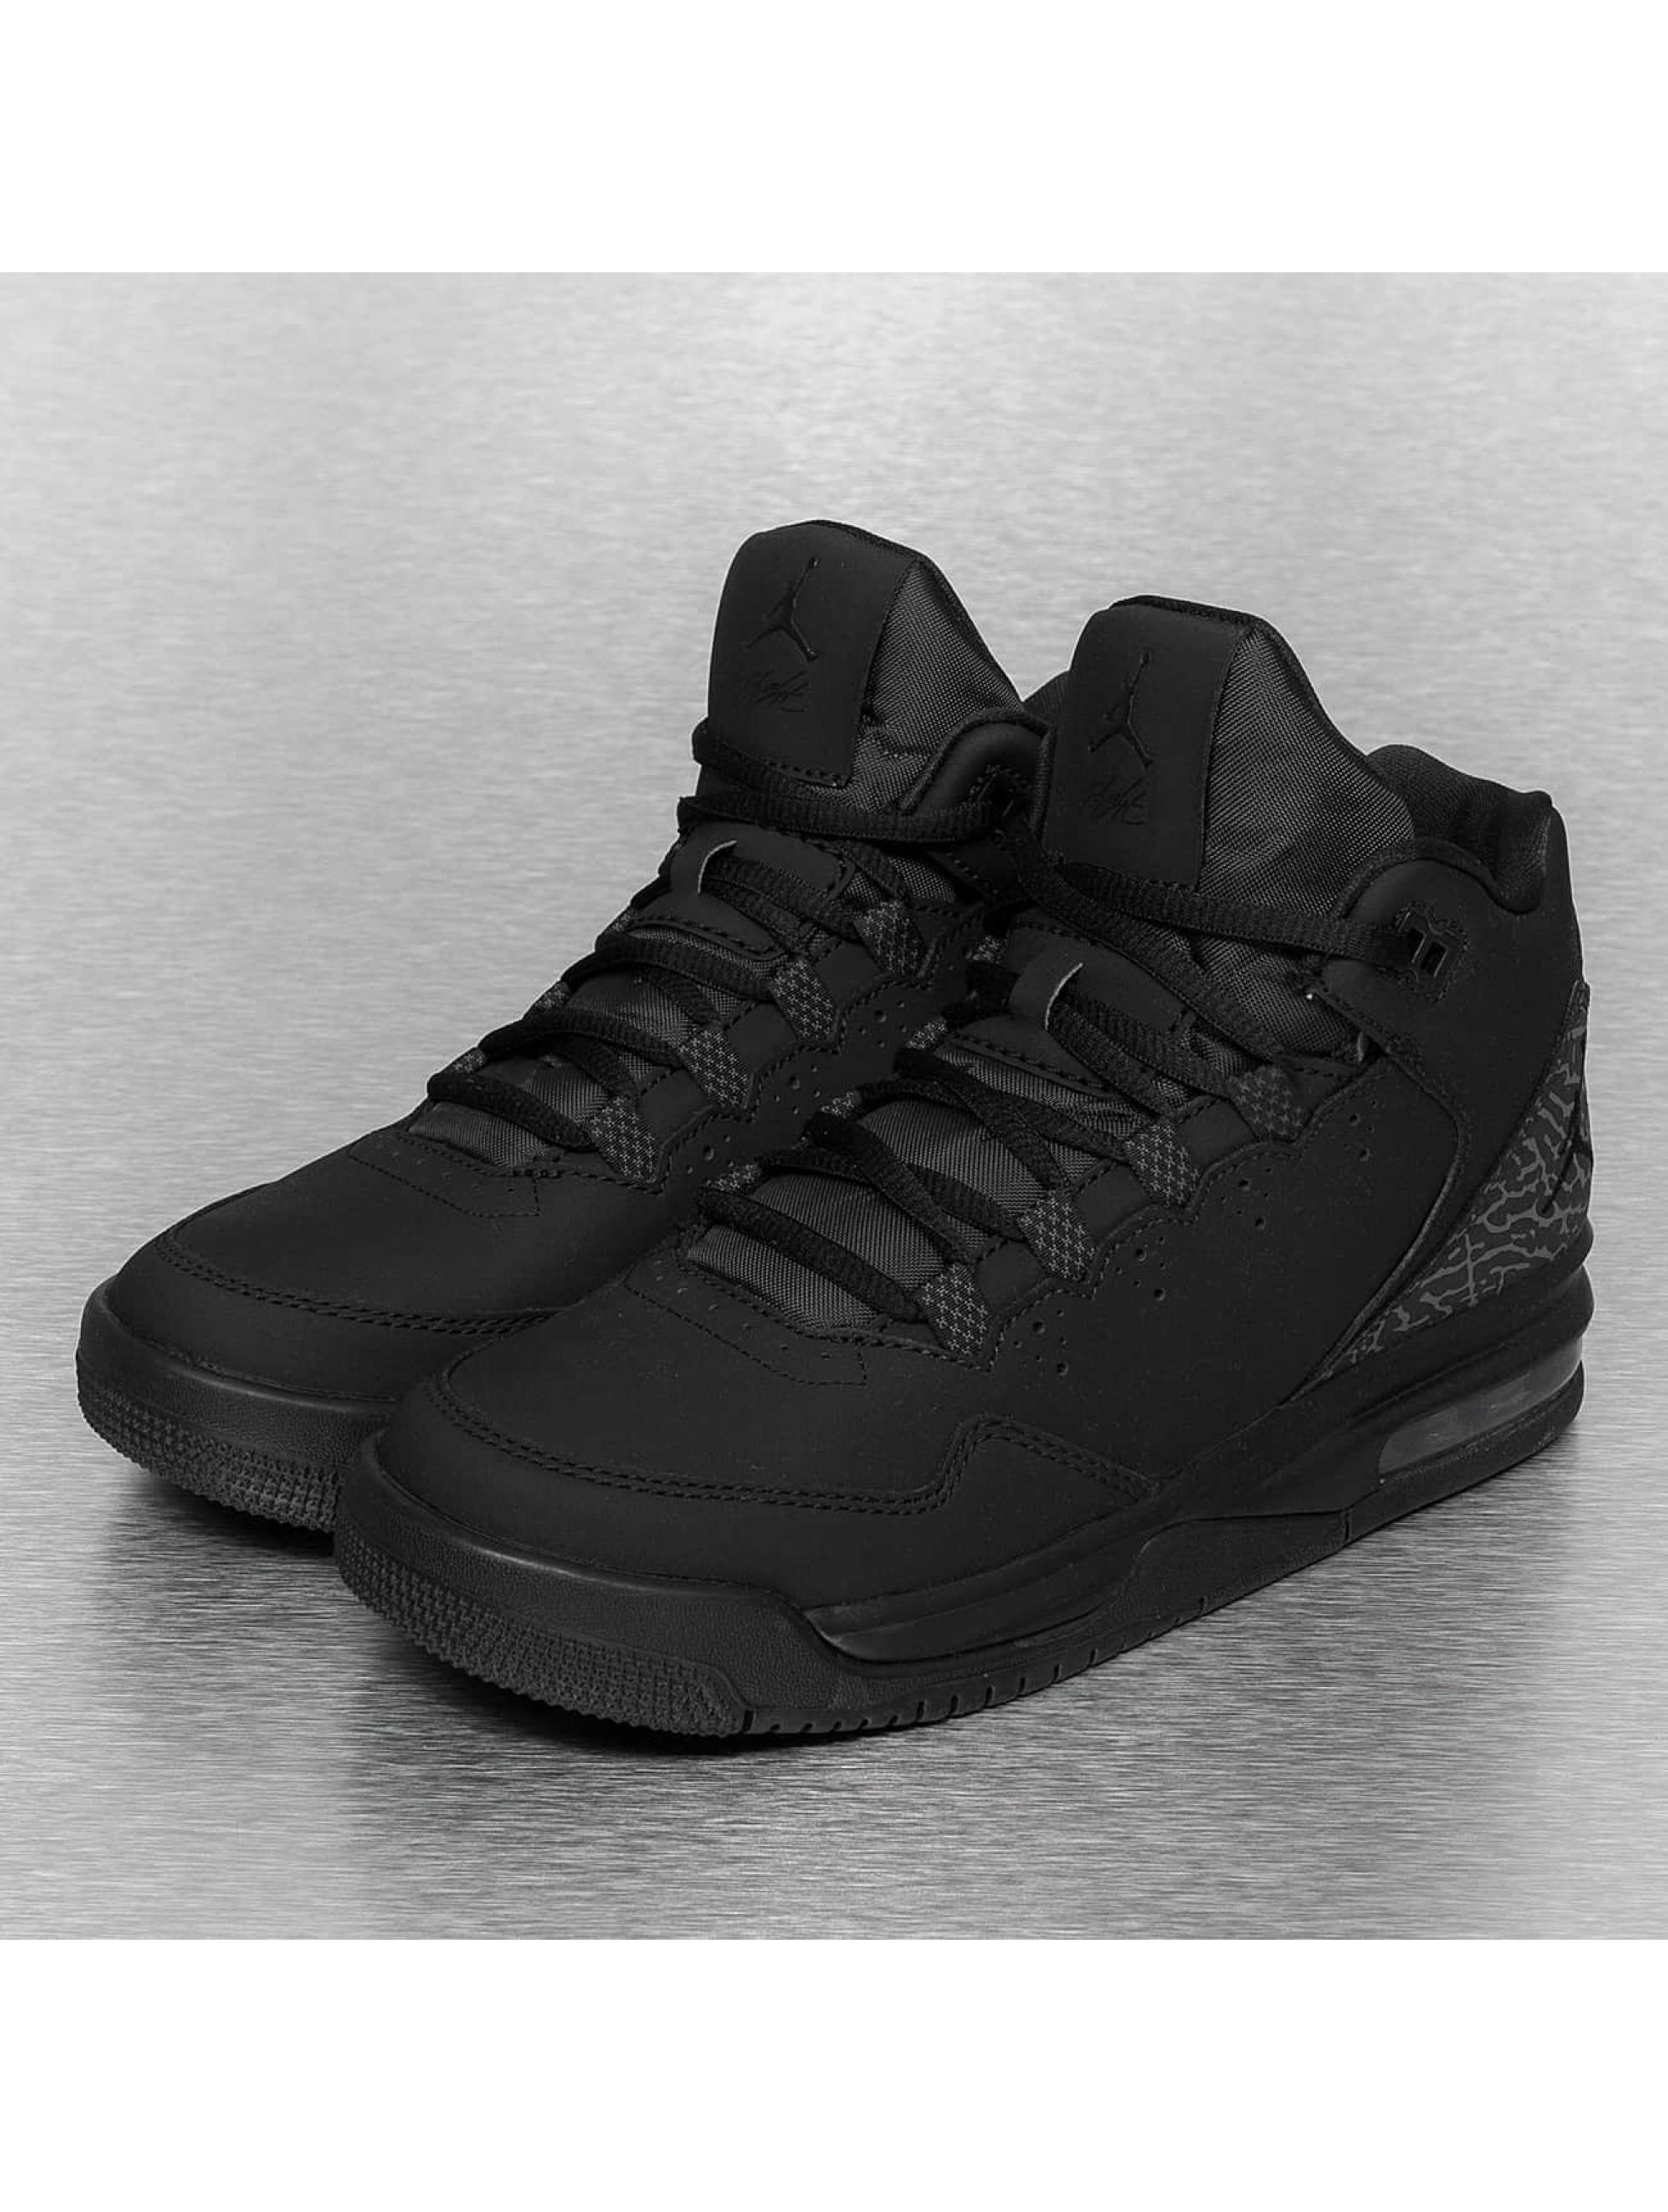 Nike High Top Sneaker Damen s-pruesse.de